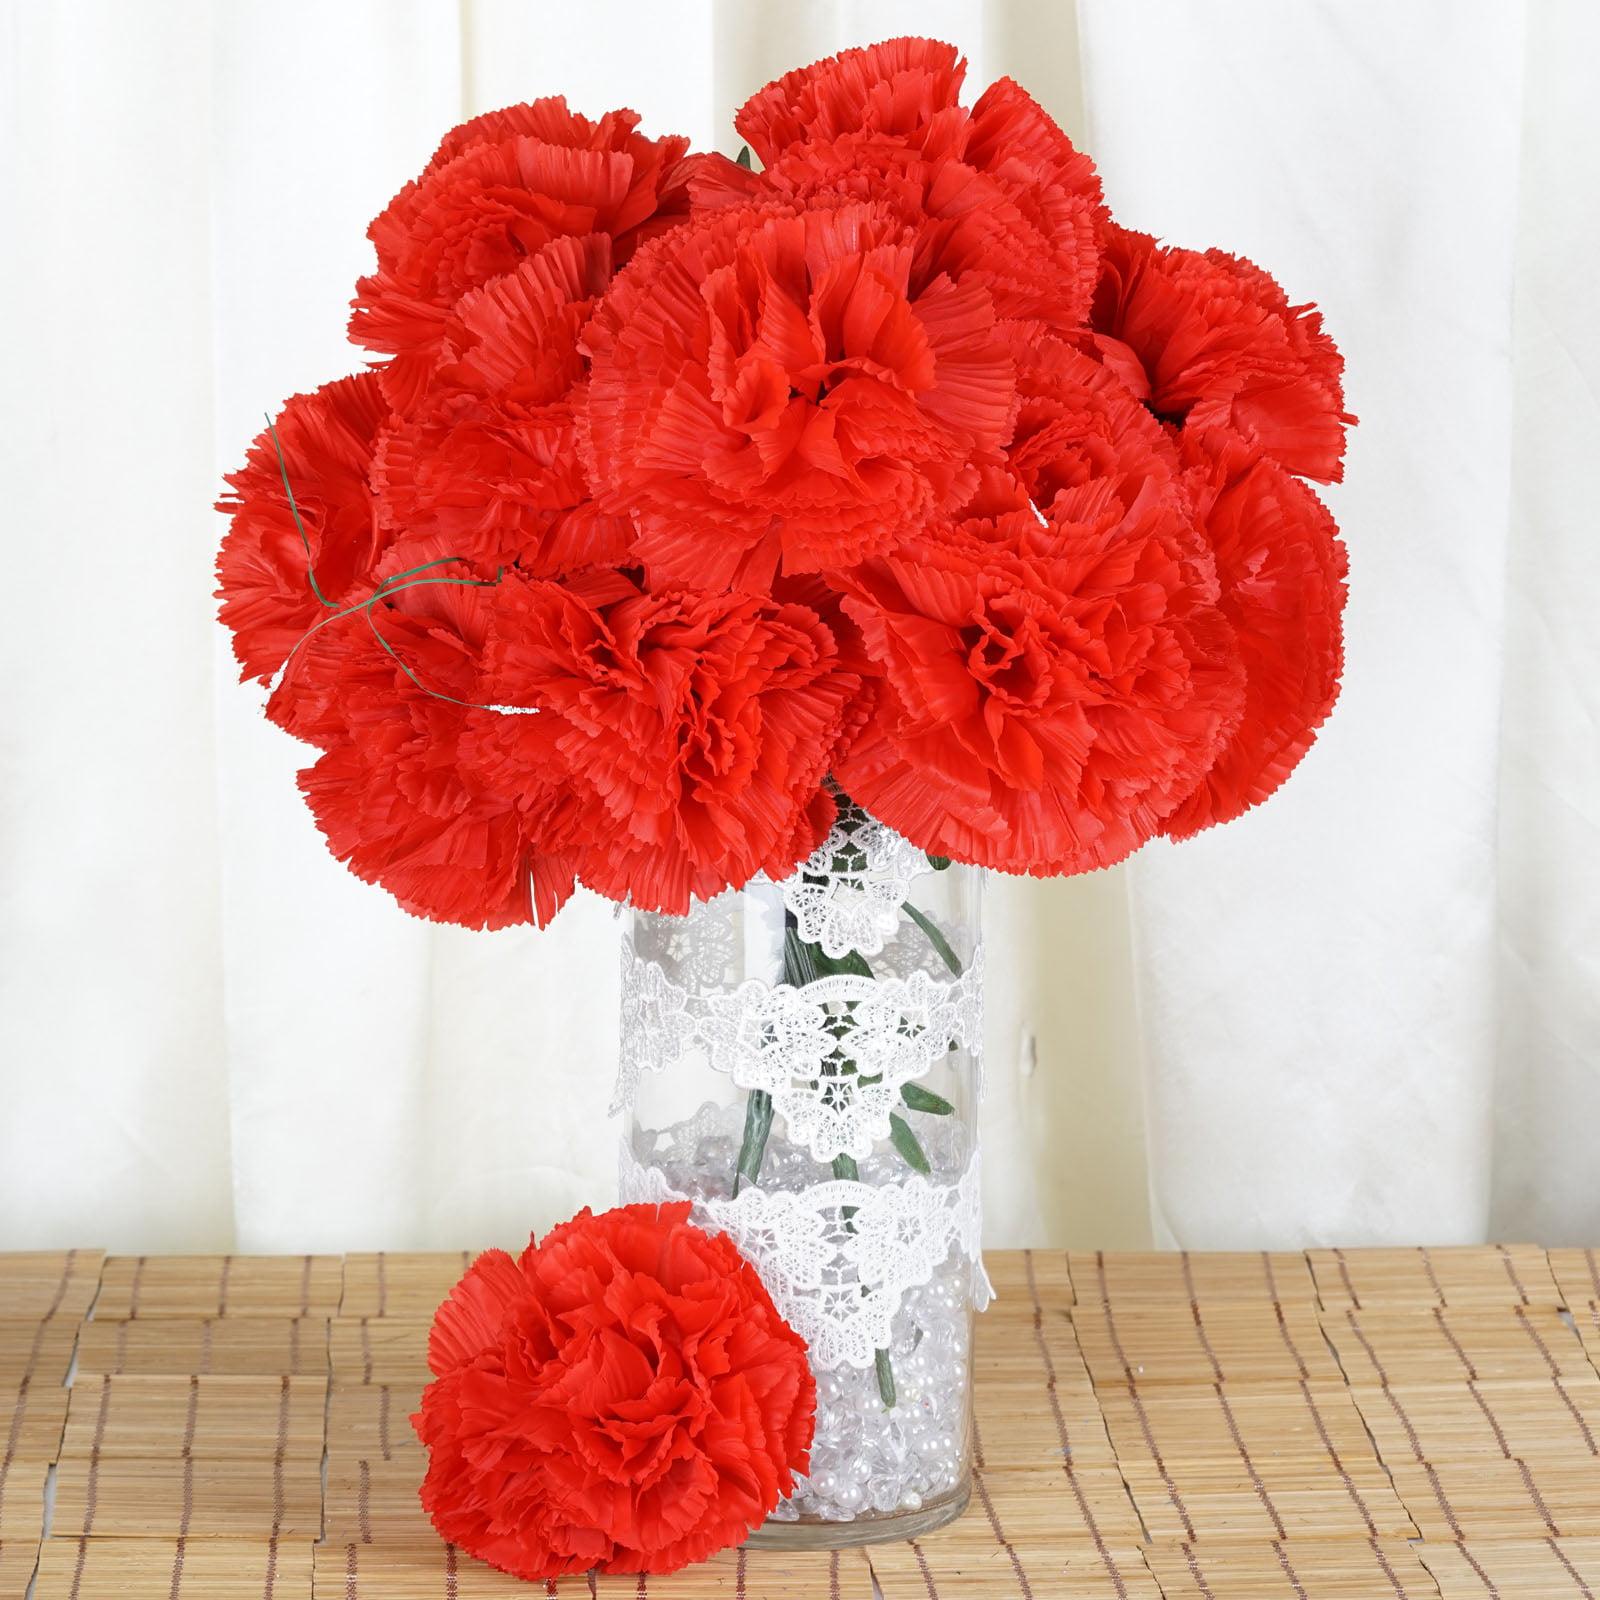 Balsacircle 36 Extra Large Silk Carnations Flowers Diy Home